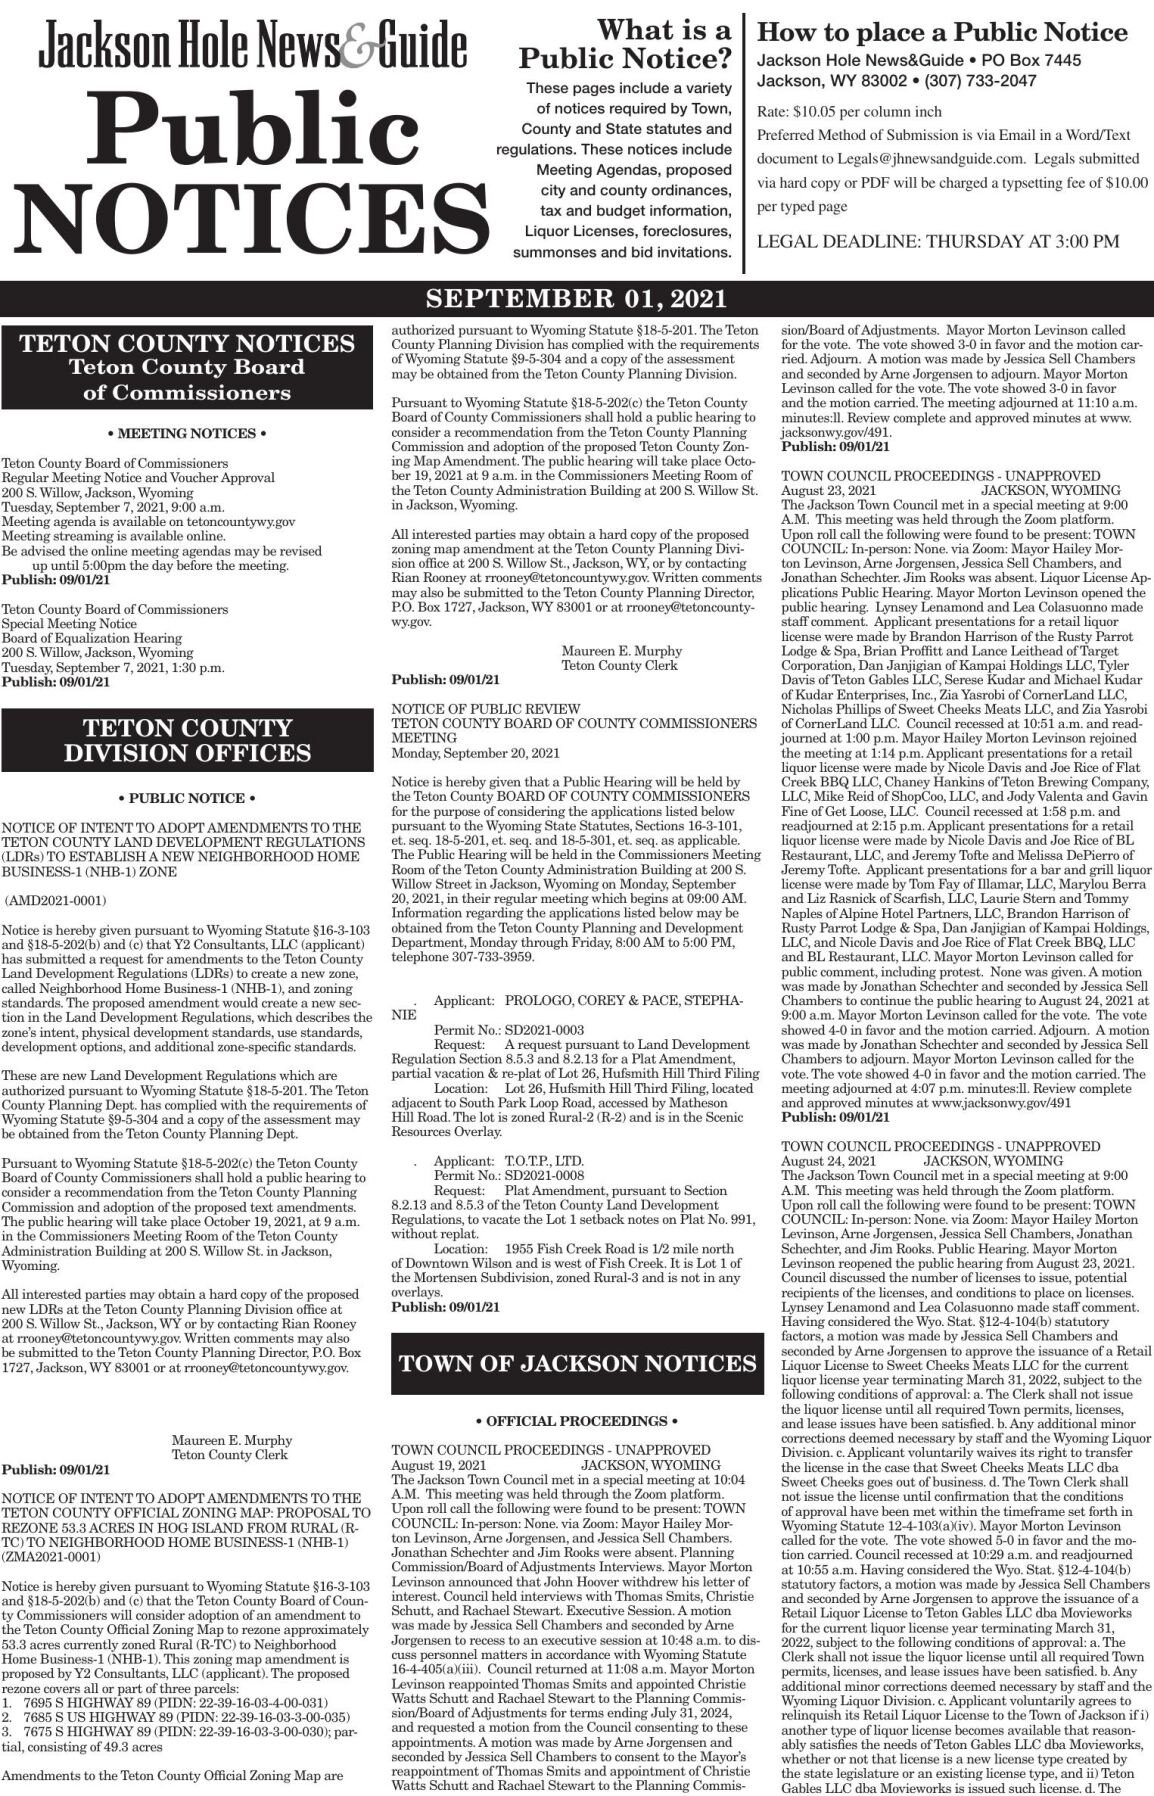 Public Notices, Sept 01, 2021